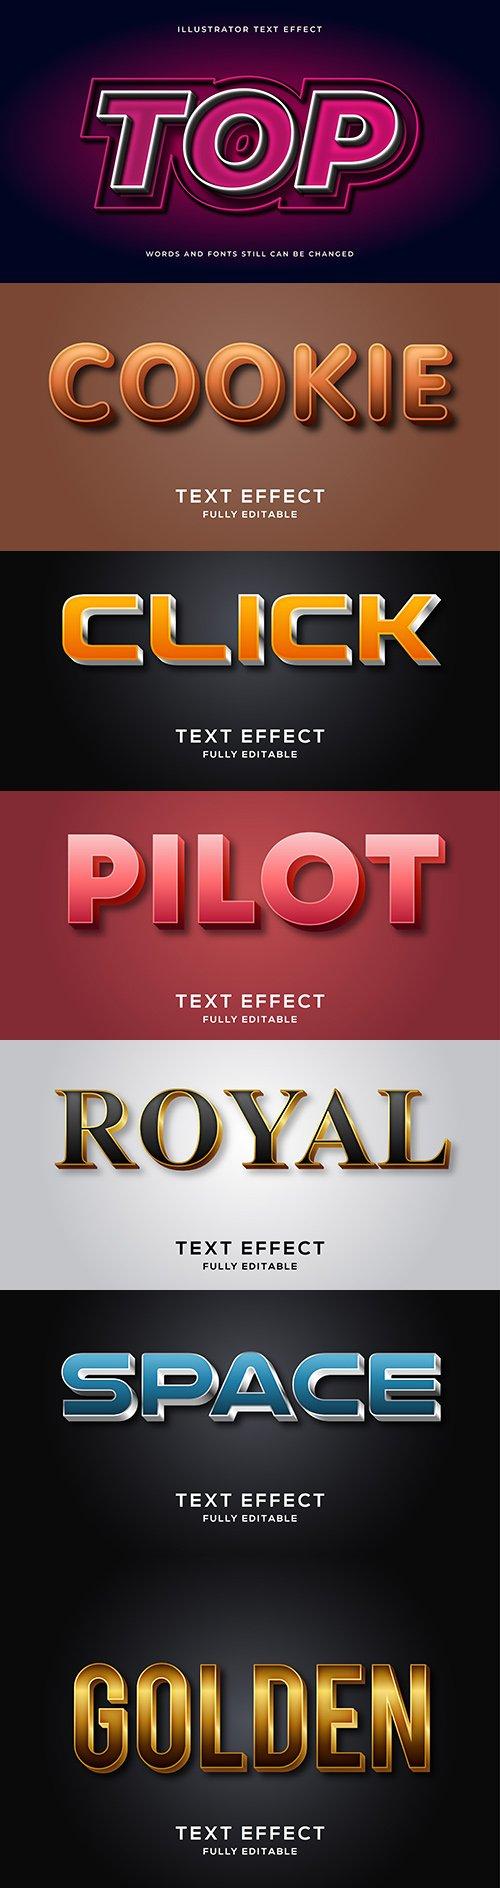 Editable font effect text collection illustration design 44